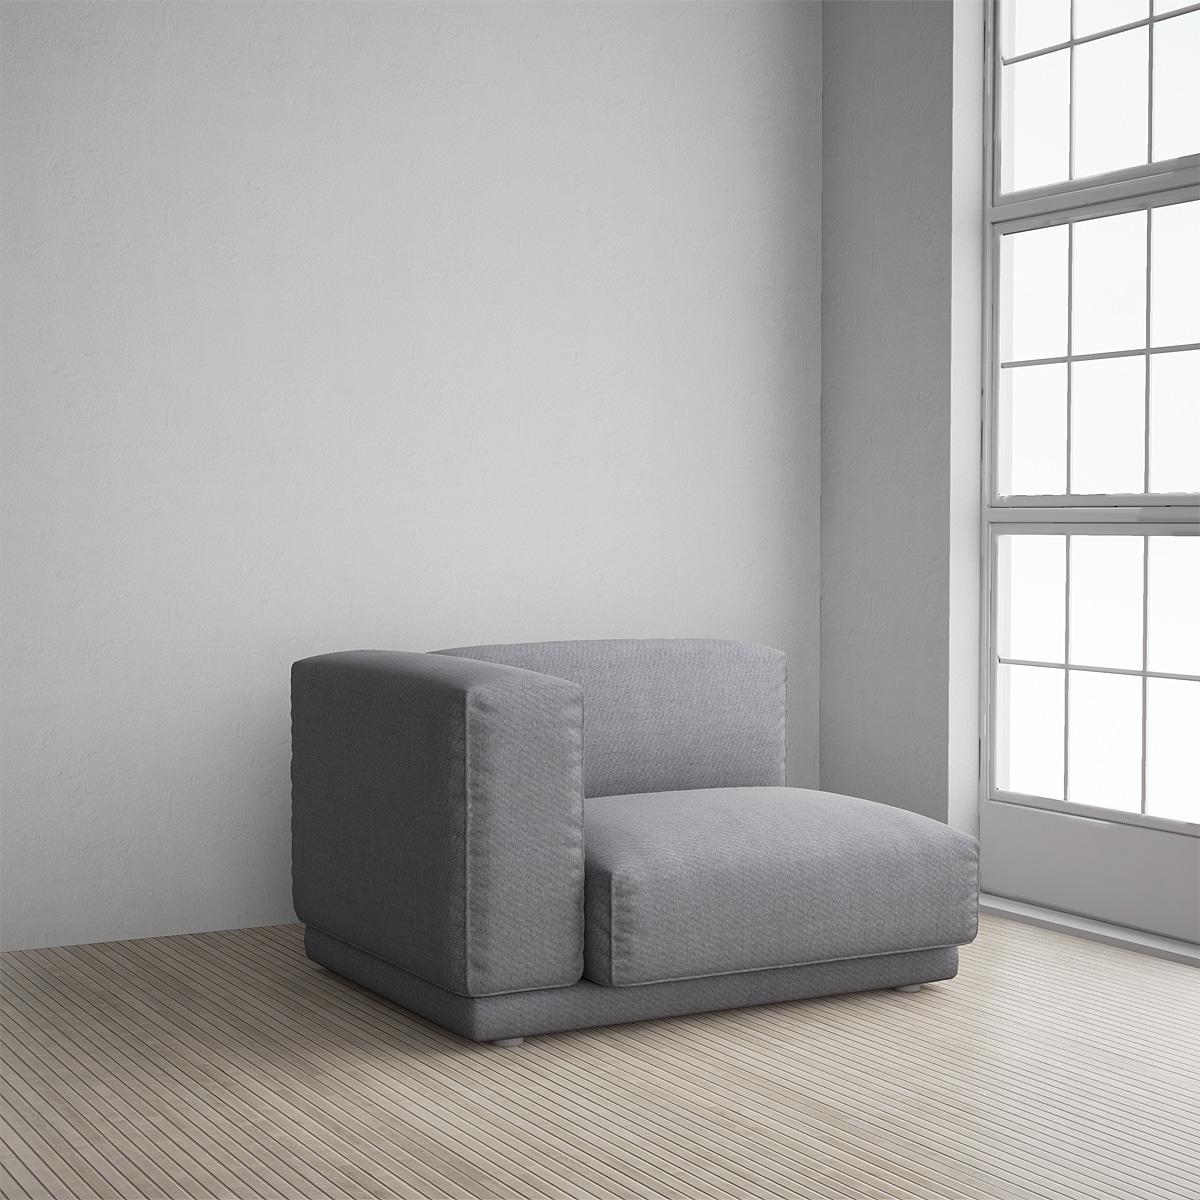 vitra collage sofa module 04 ue4arch. Black Bedroom Furniture Sets. Home Design Ideas